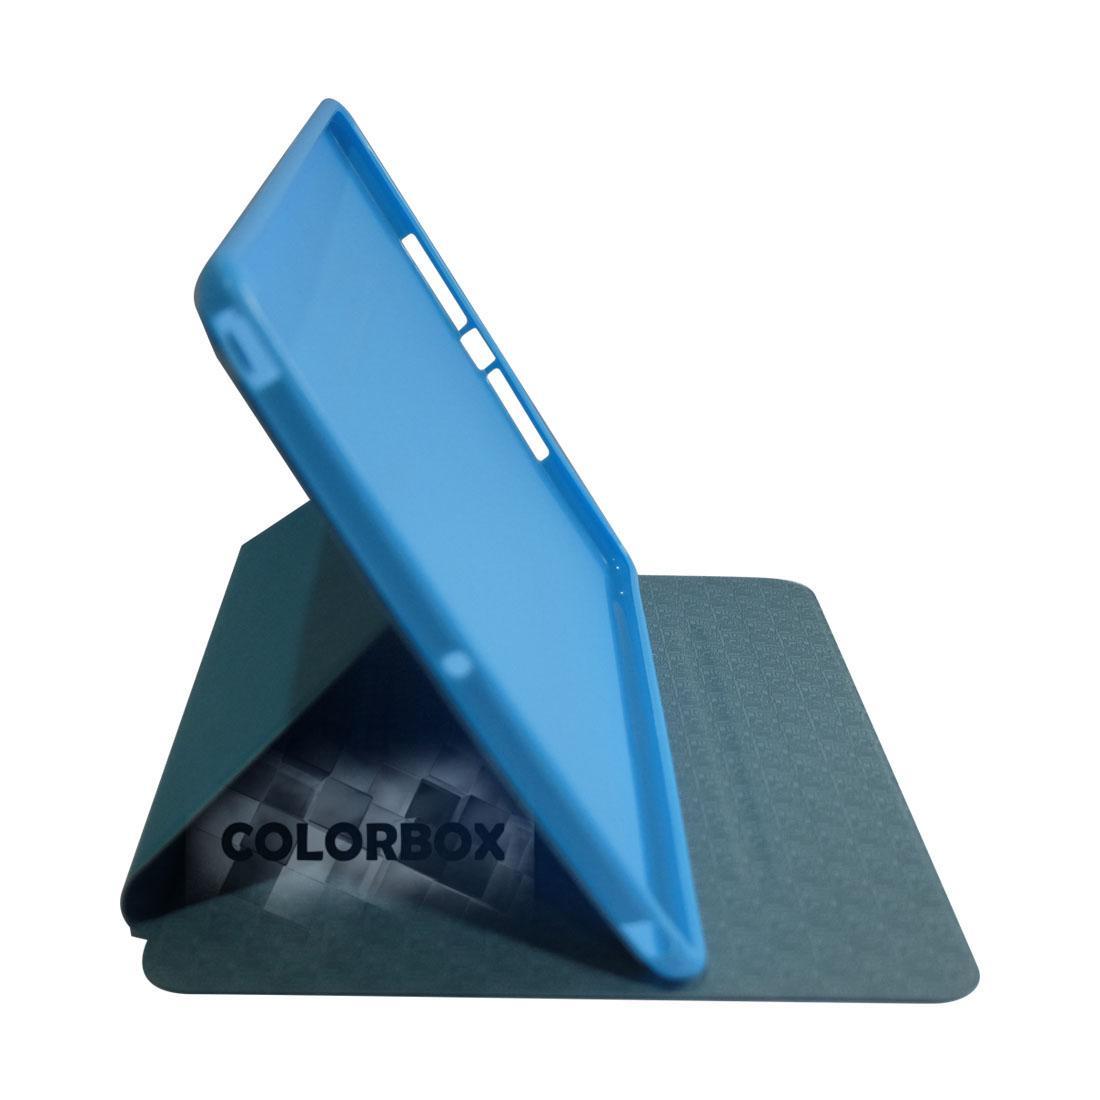 MR iPad Air 2 Flipshell iPad 6 / Flipcover iPad Air 2 / Sarung Case Dompet iPad 6 / Sarung Ipad Air